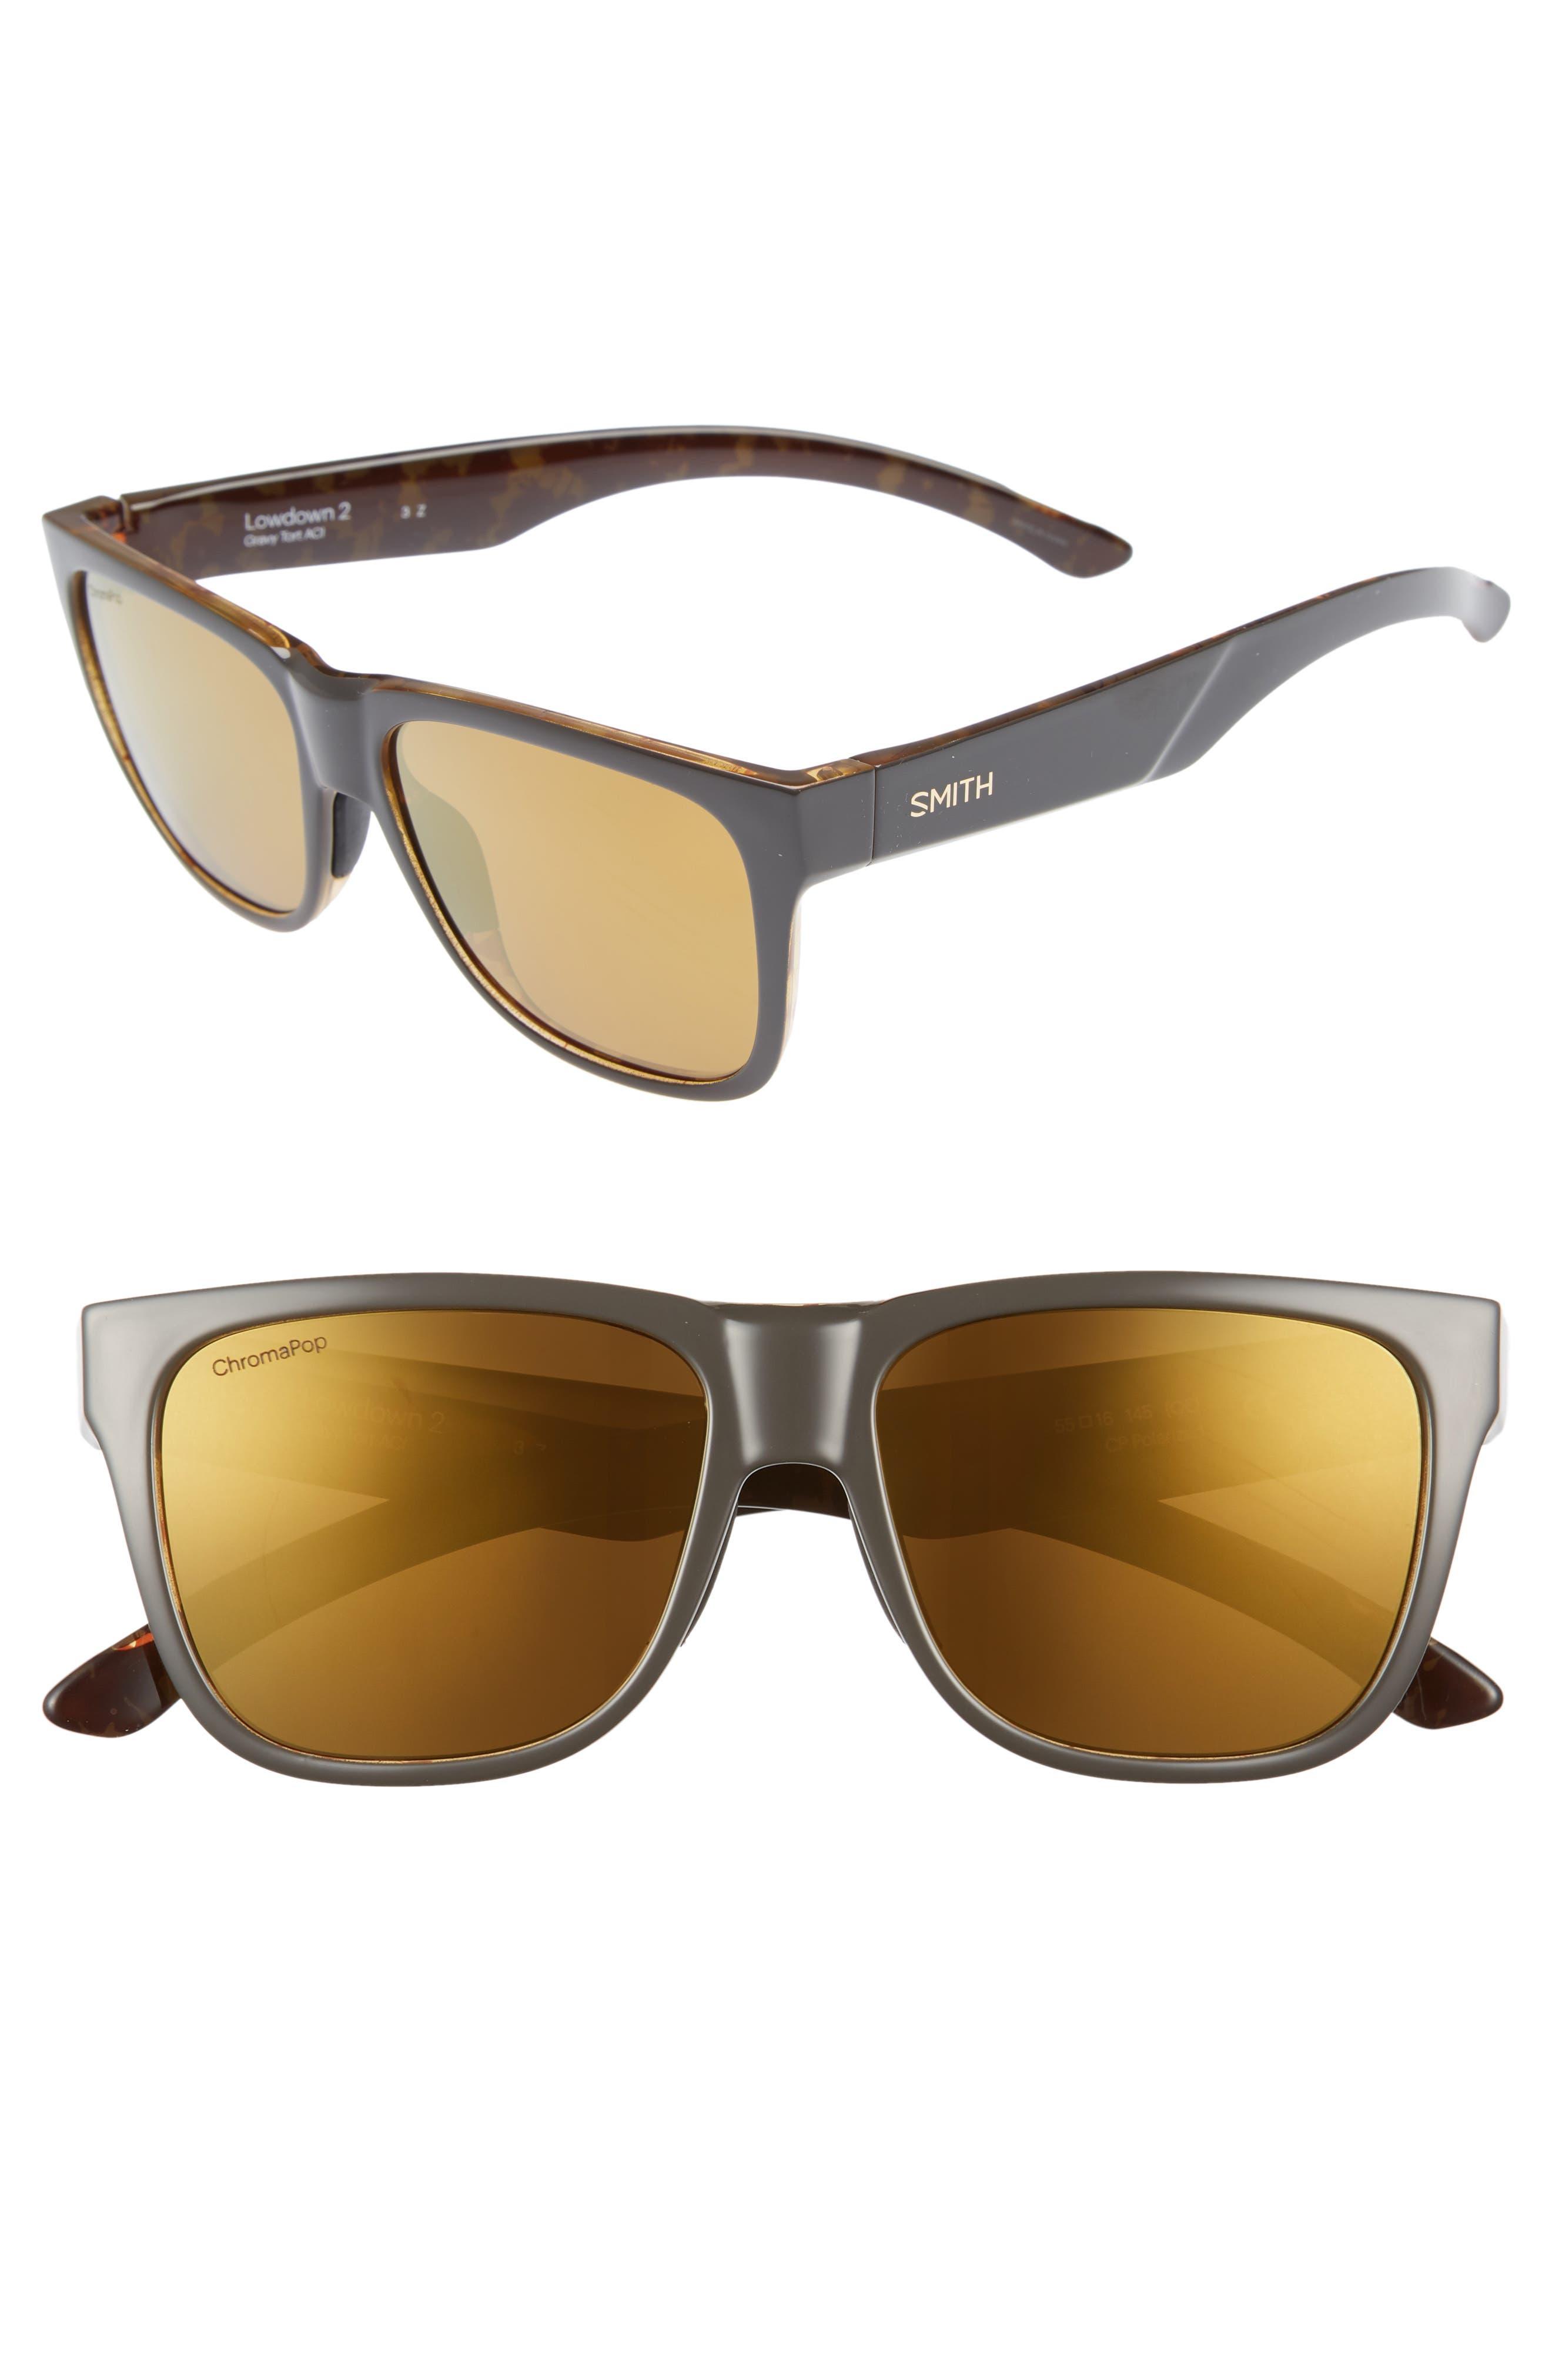 Lowdown 2 55mm ChromaPop<sup>™</sup> Square Sunglasses,                             Main thumbnail 1, color,                             GRAVY TORTOISE